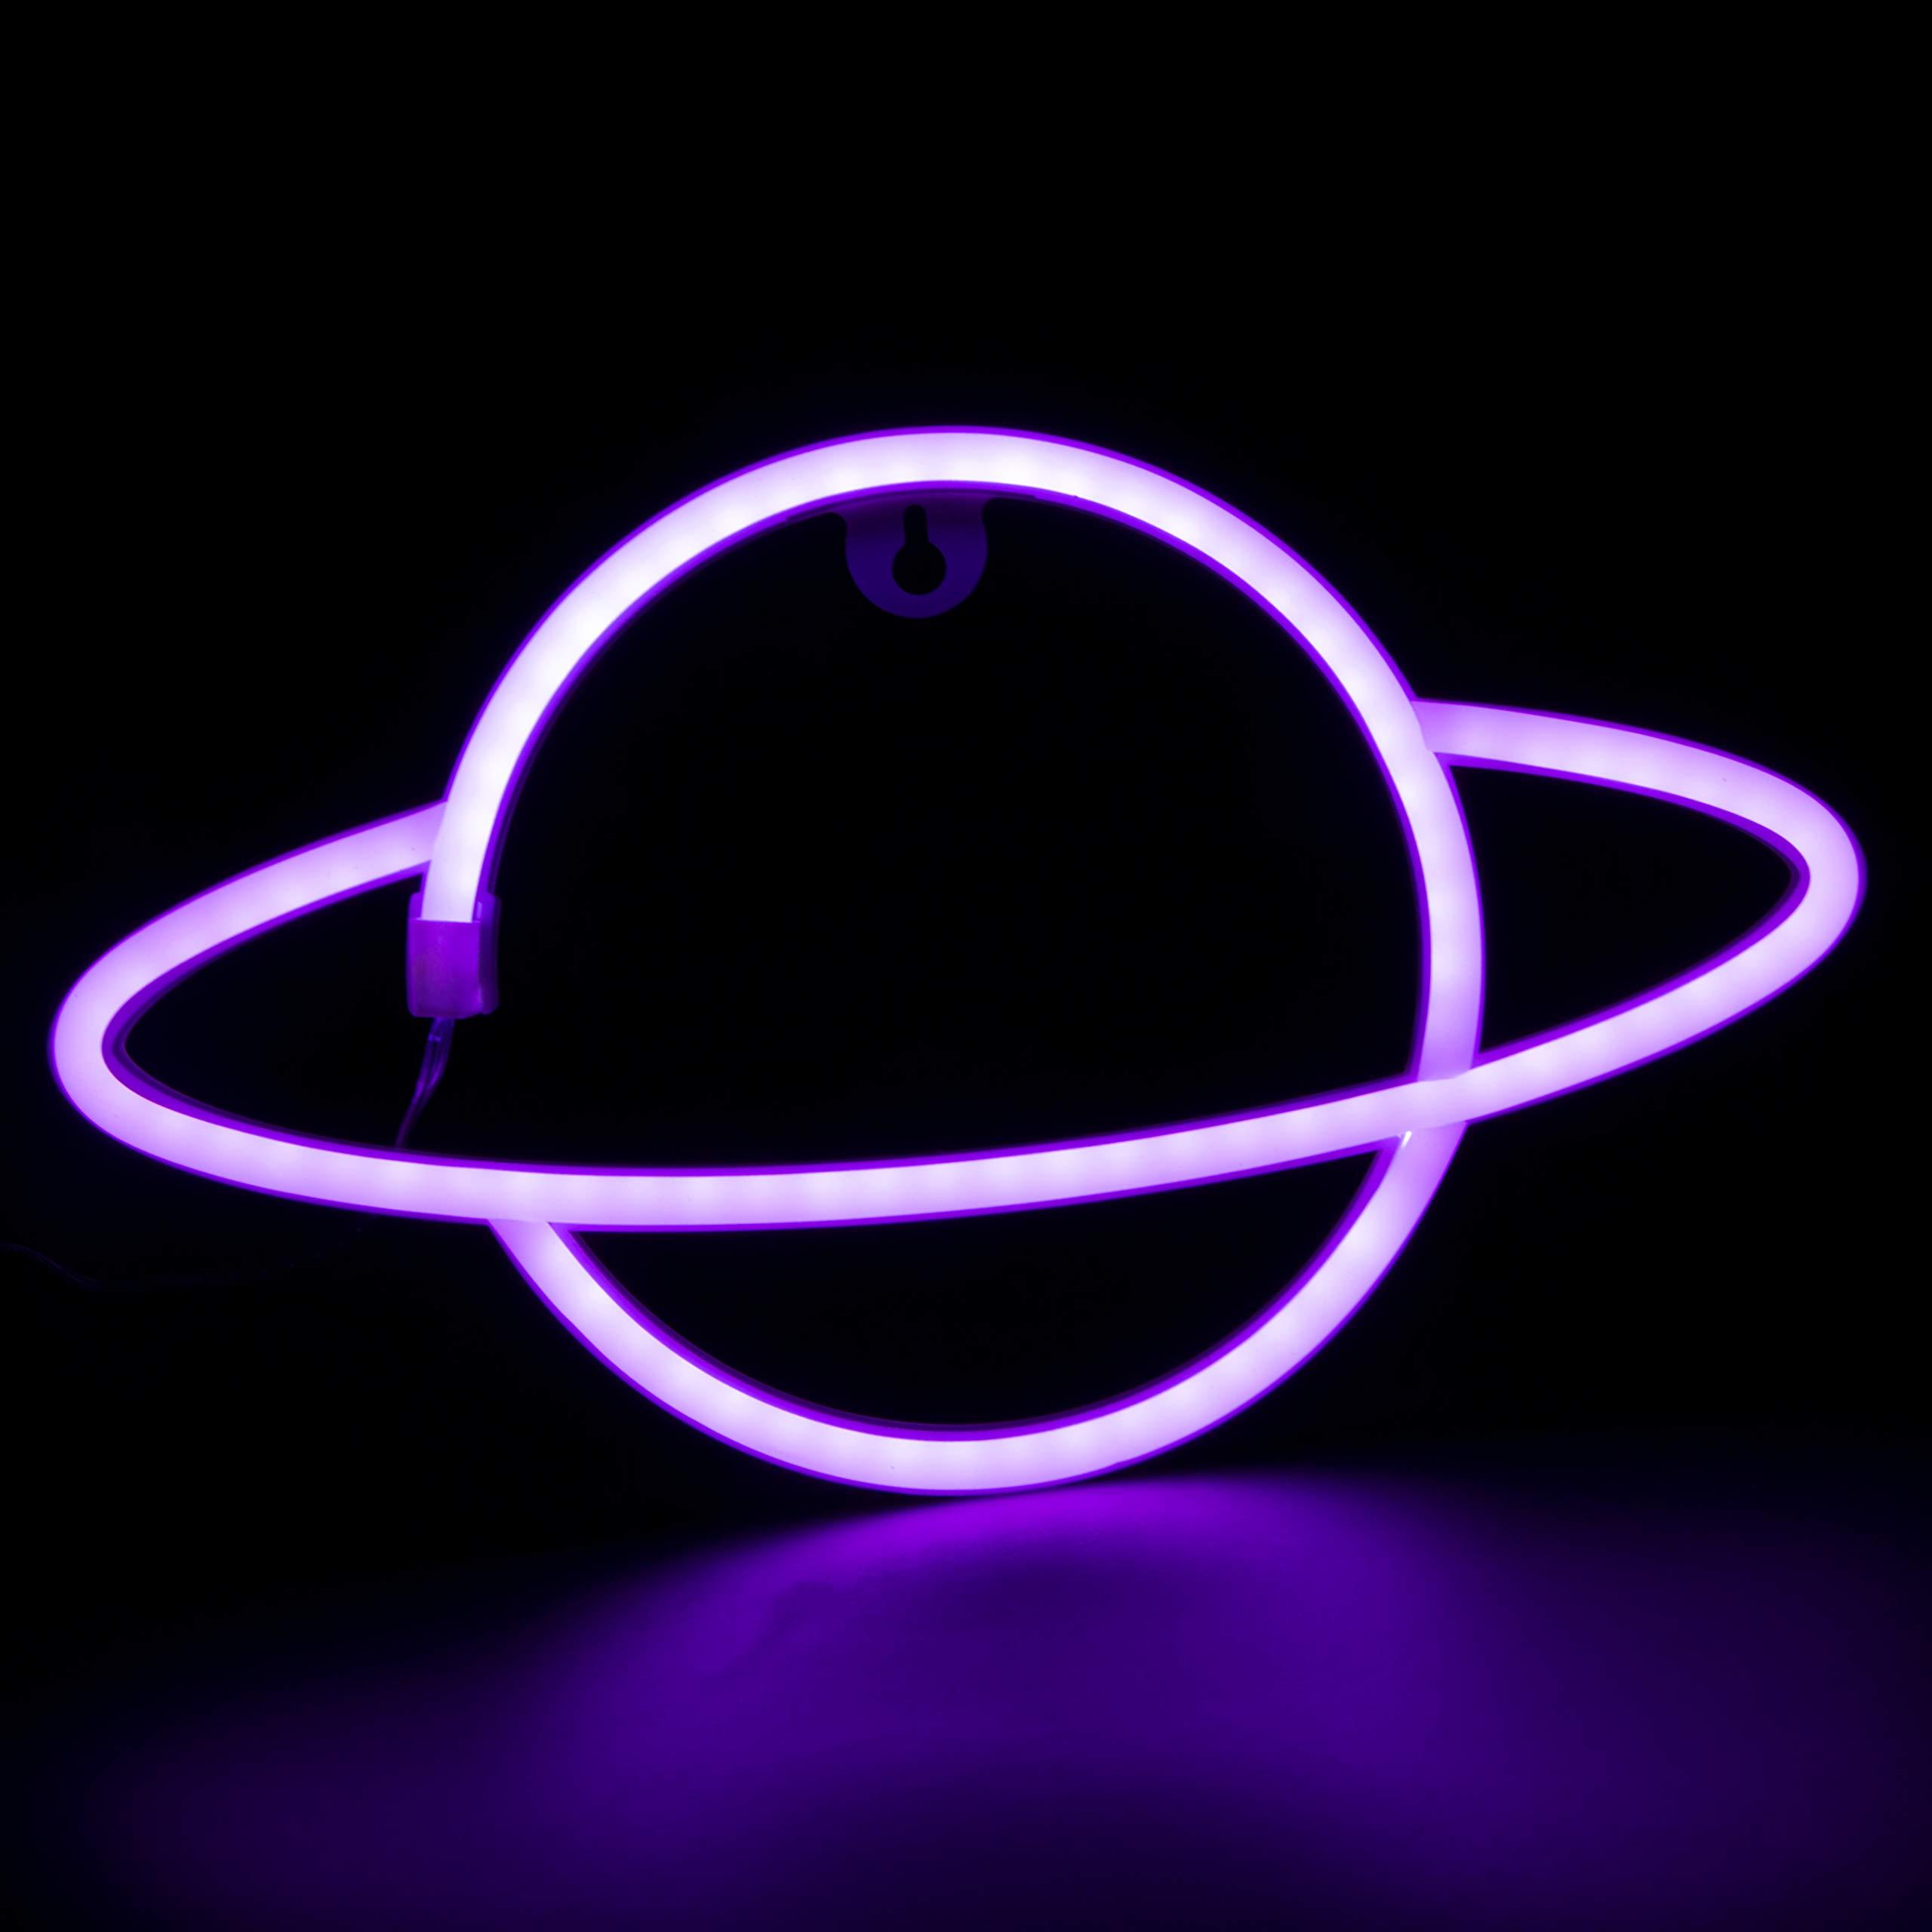 Ahirawin Neon SignsLights for Bedroom WallDecorBattery & USB Powered Aesthetic Led Neon Light for Teen Girls LivingRoom Party Decoration (Purple)